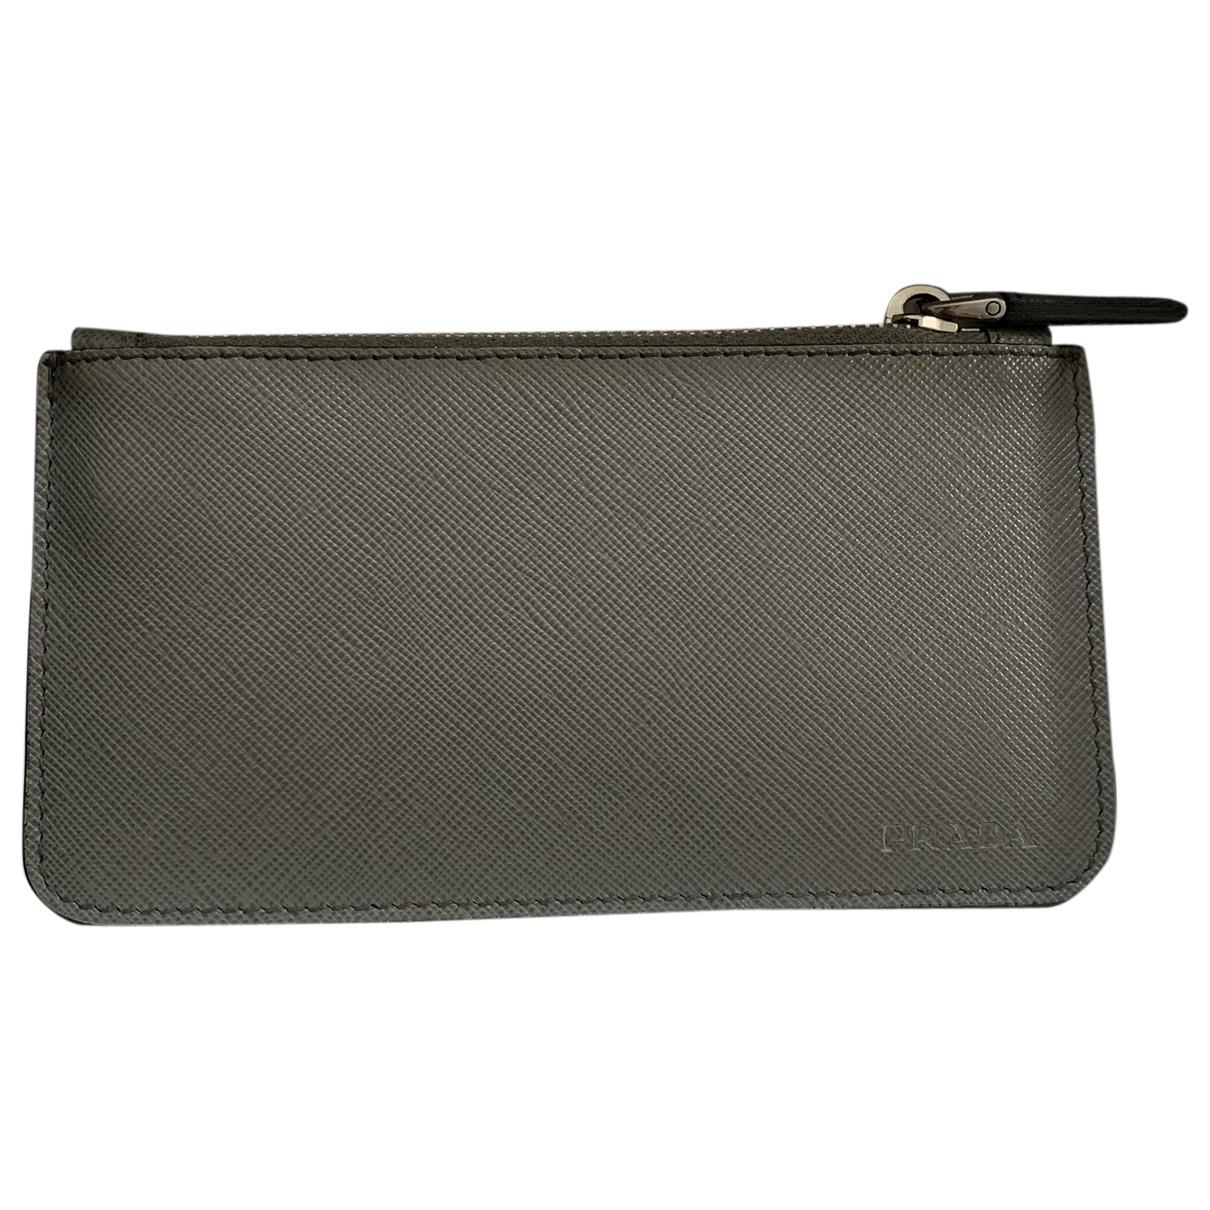 Prada N Grey Leather Small bag, wallet & cases for Men N